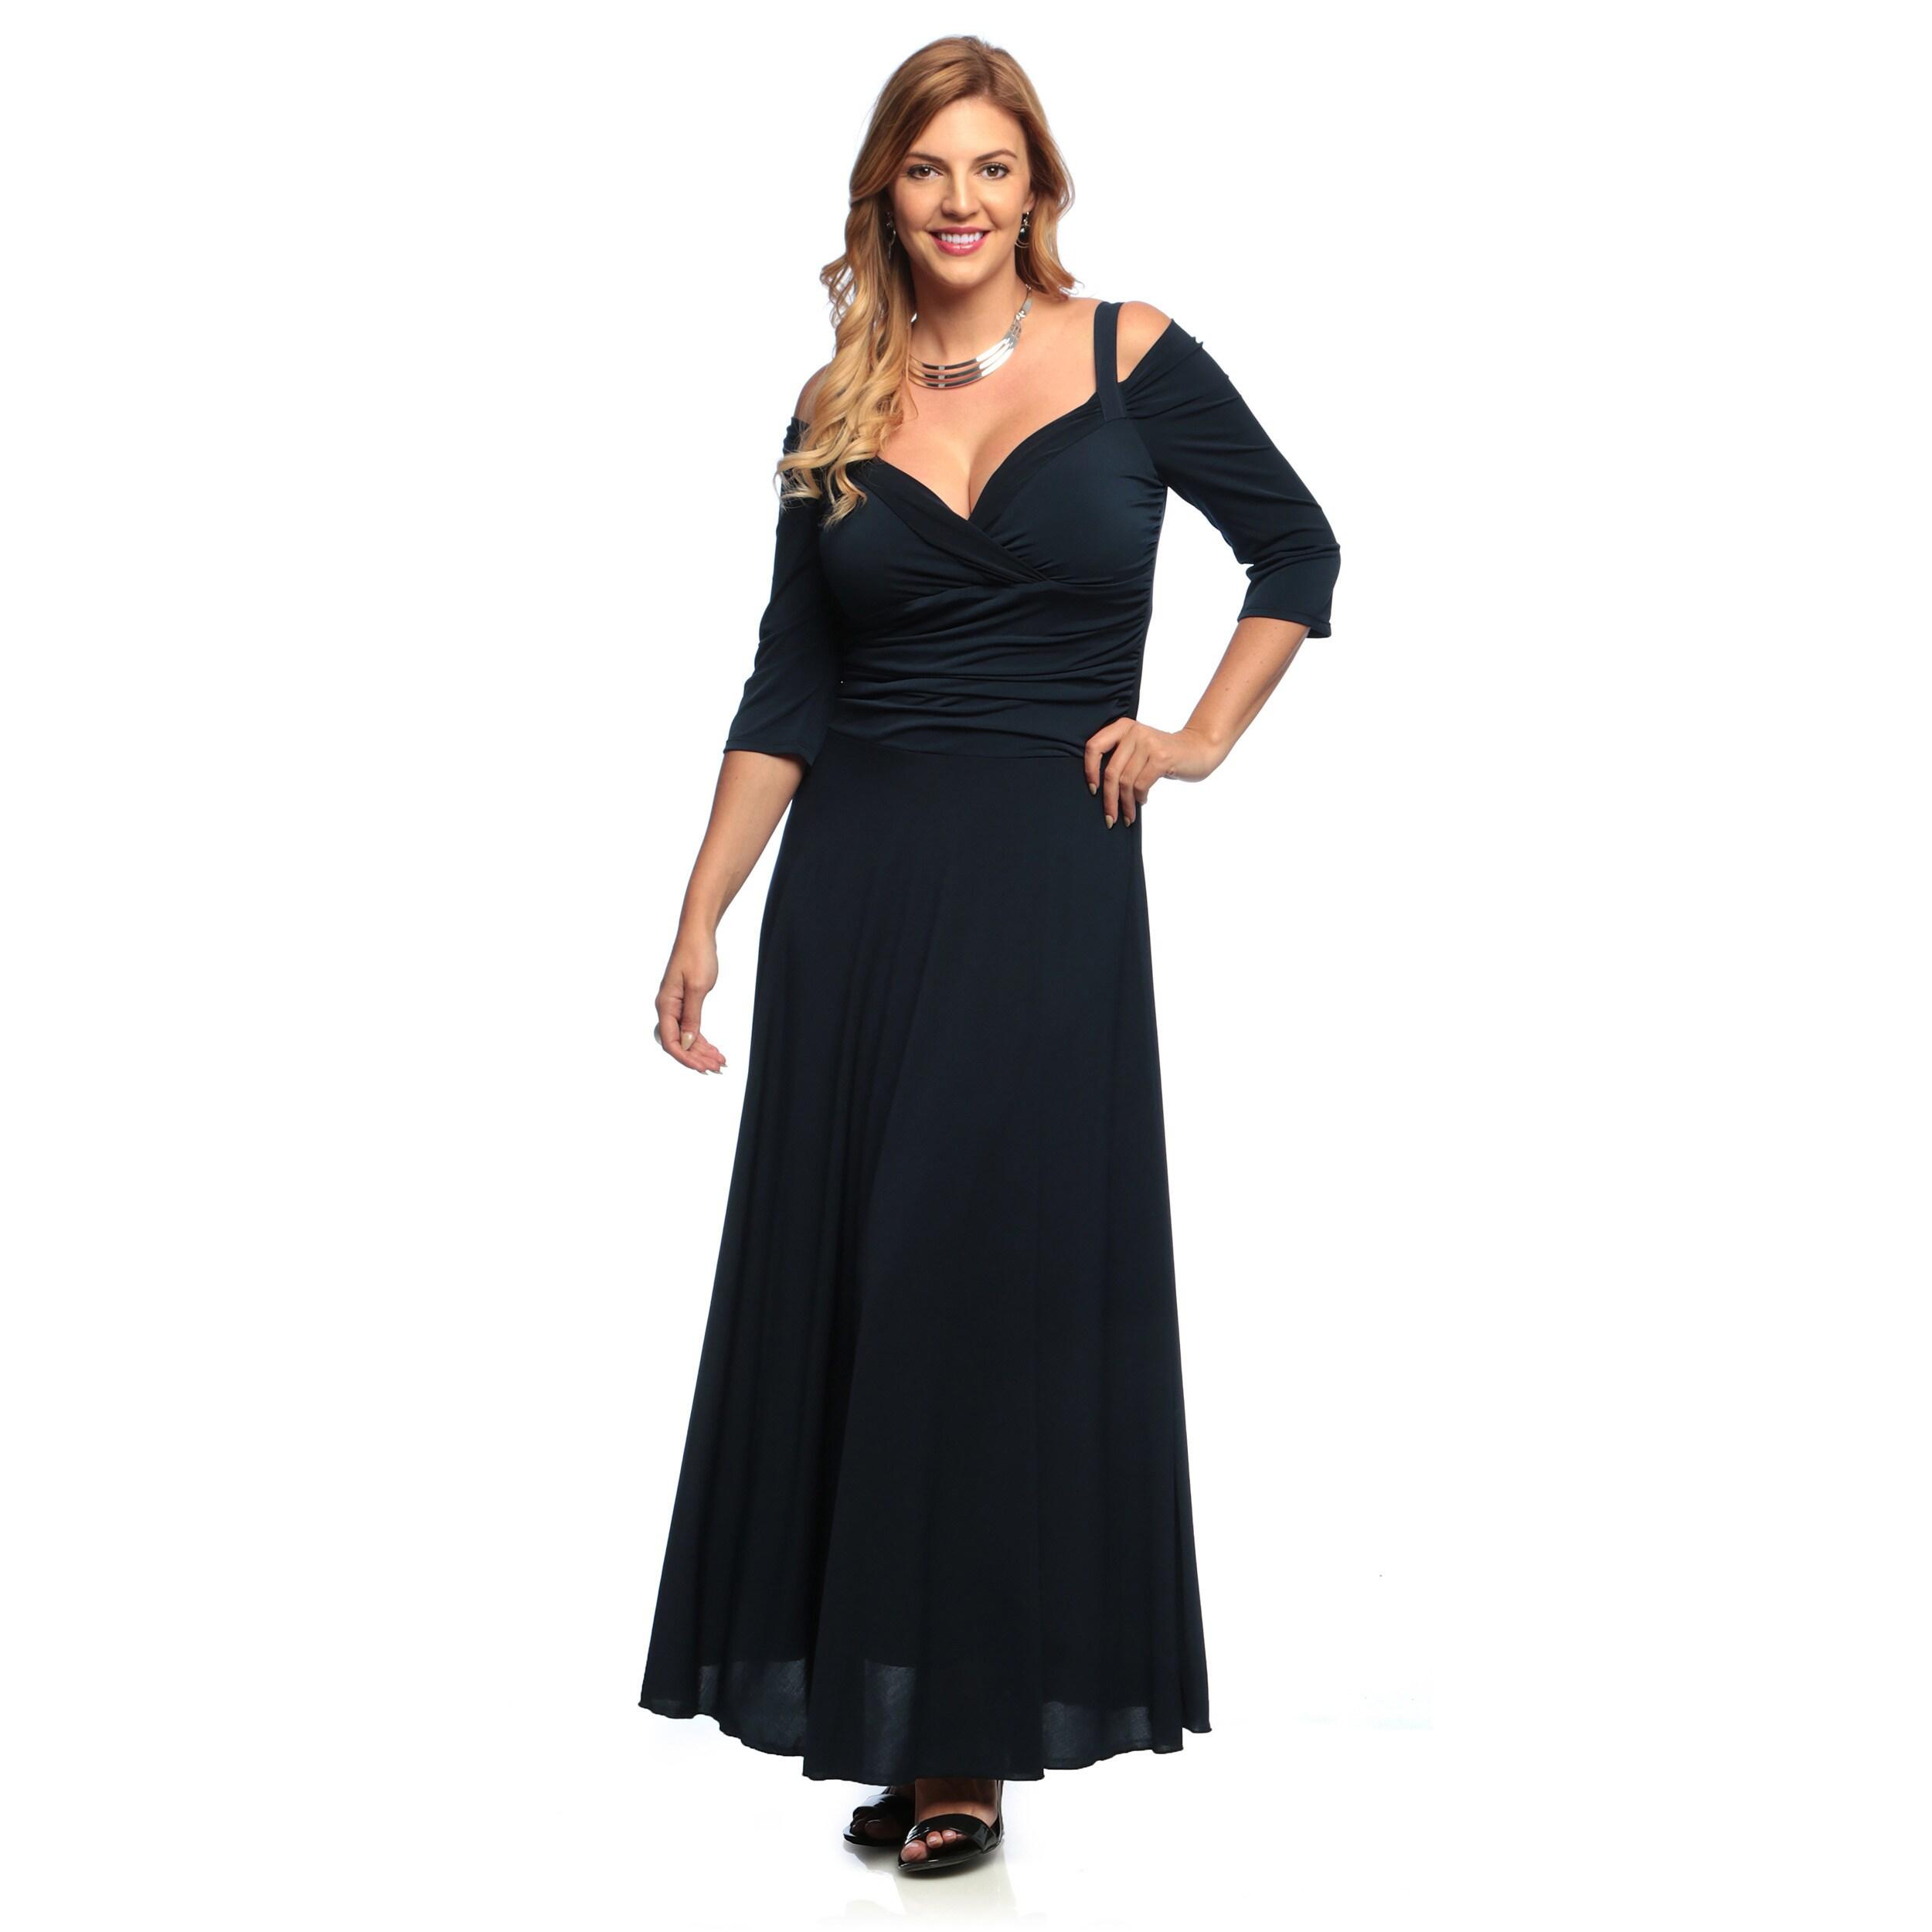 Evanese Womens Plus Size 34 Sleeve Long Dress Free Shipping